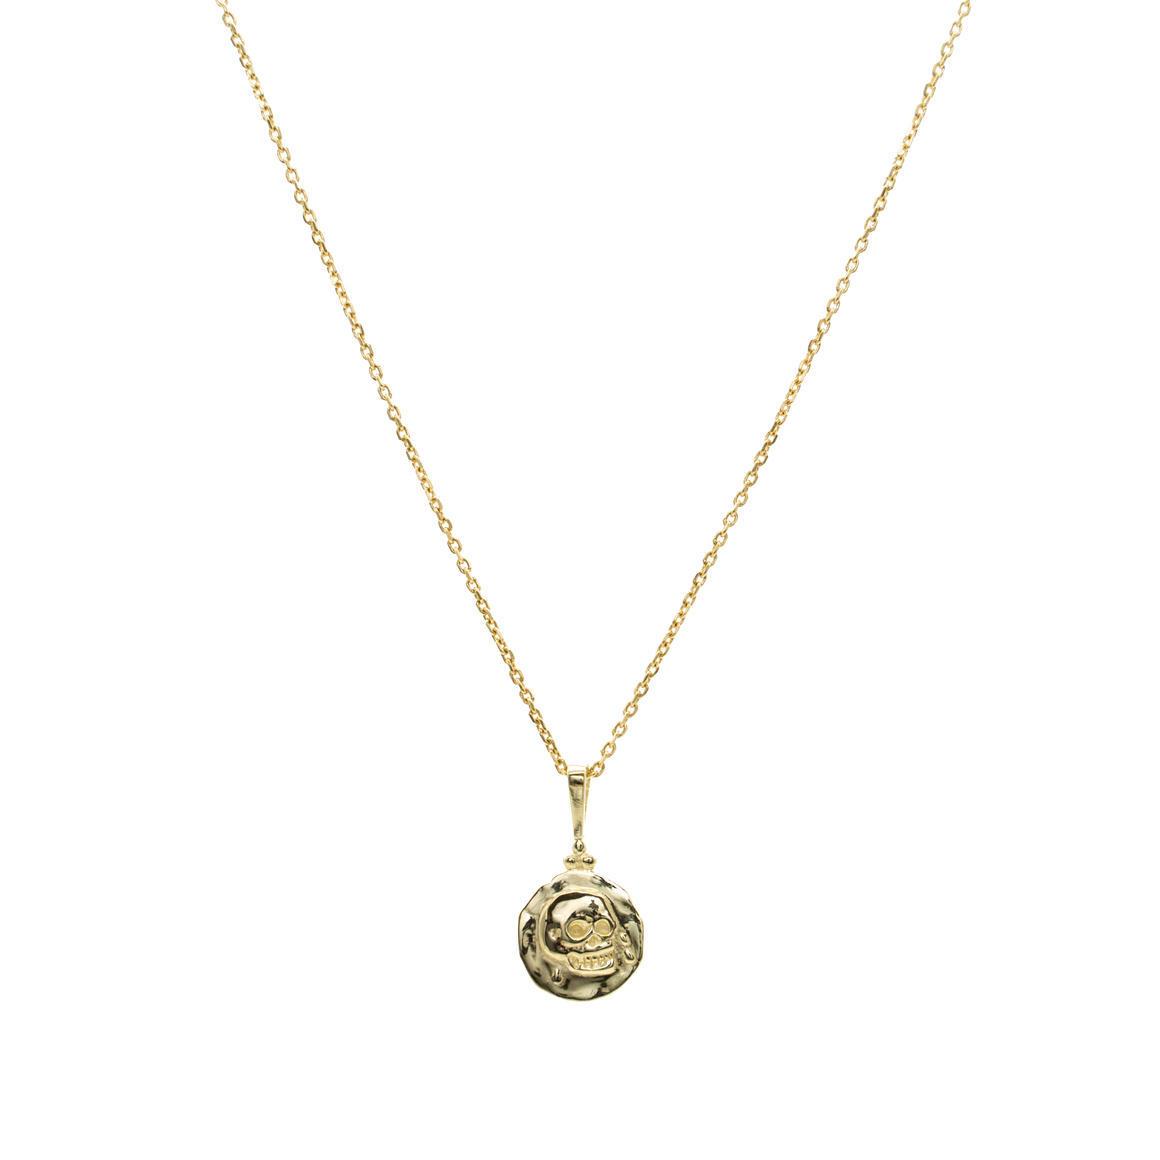 Kiara Necklace | Trada Marketplace